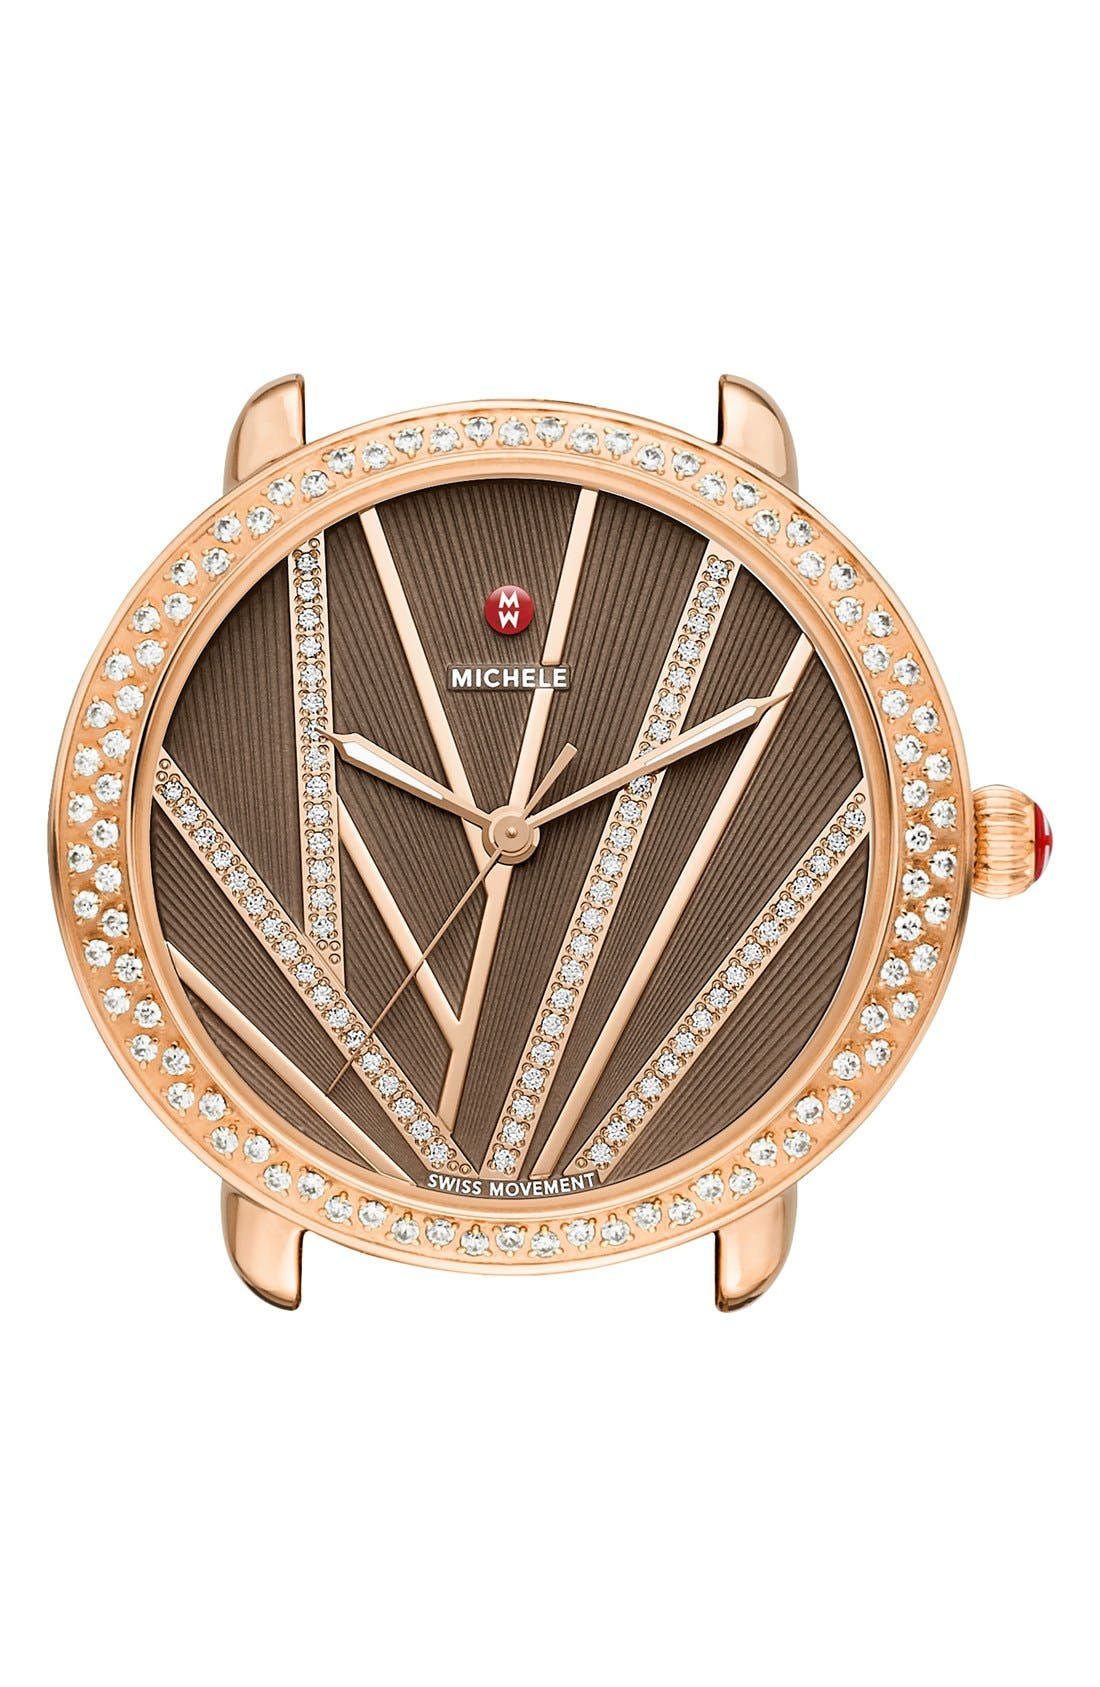 Serein Mid City Lights Diamond Diamond Dial Watch Case, 36mm,                             Main thumbnail 1, color,                             Rose Gold/ Cocoa